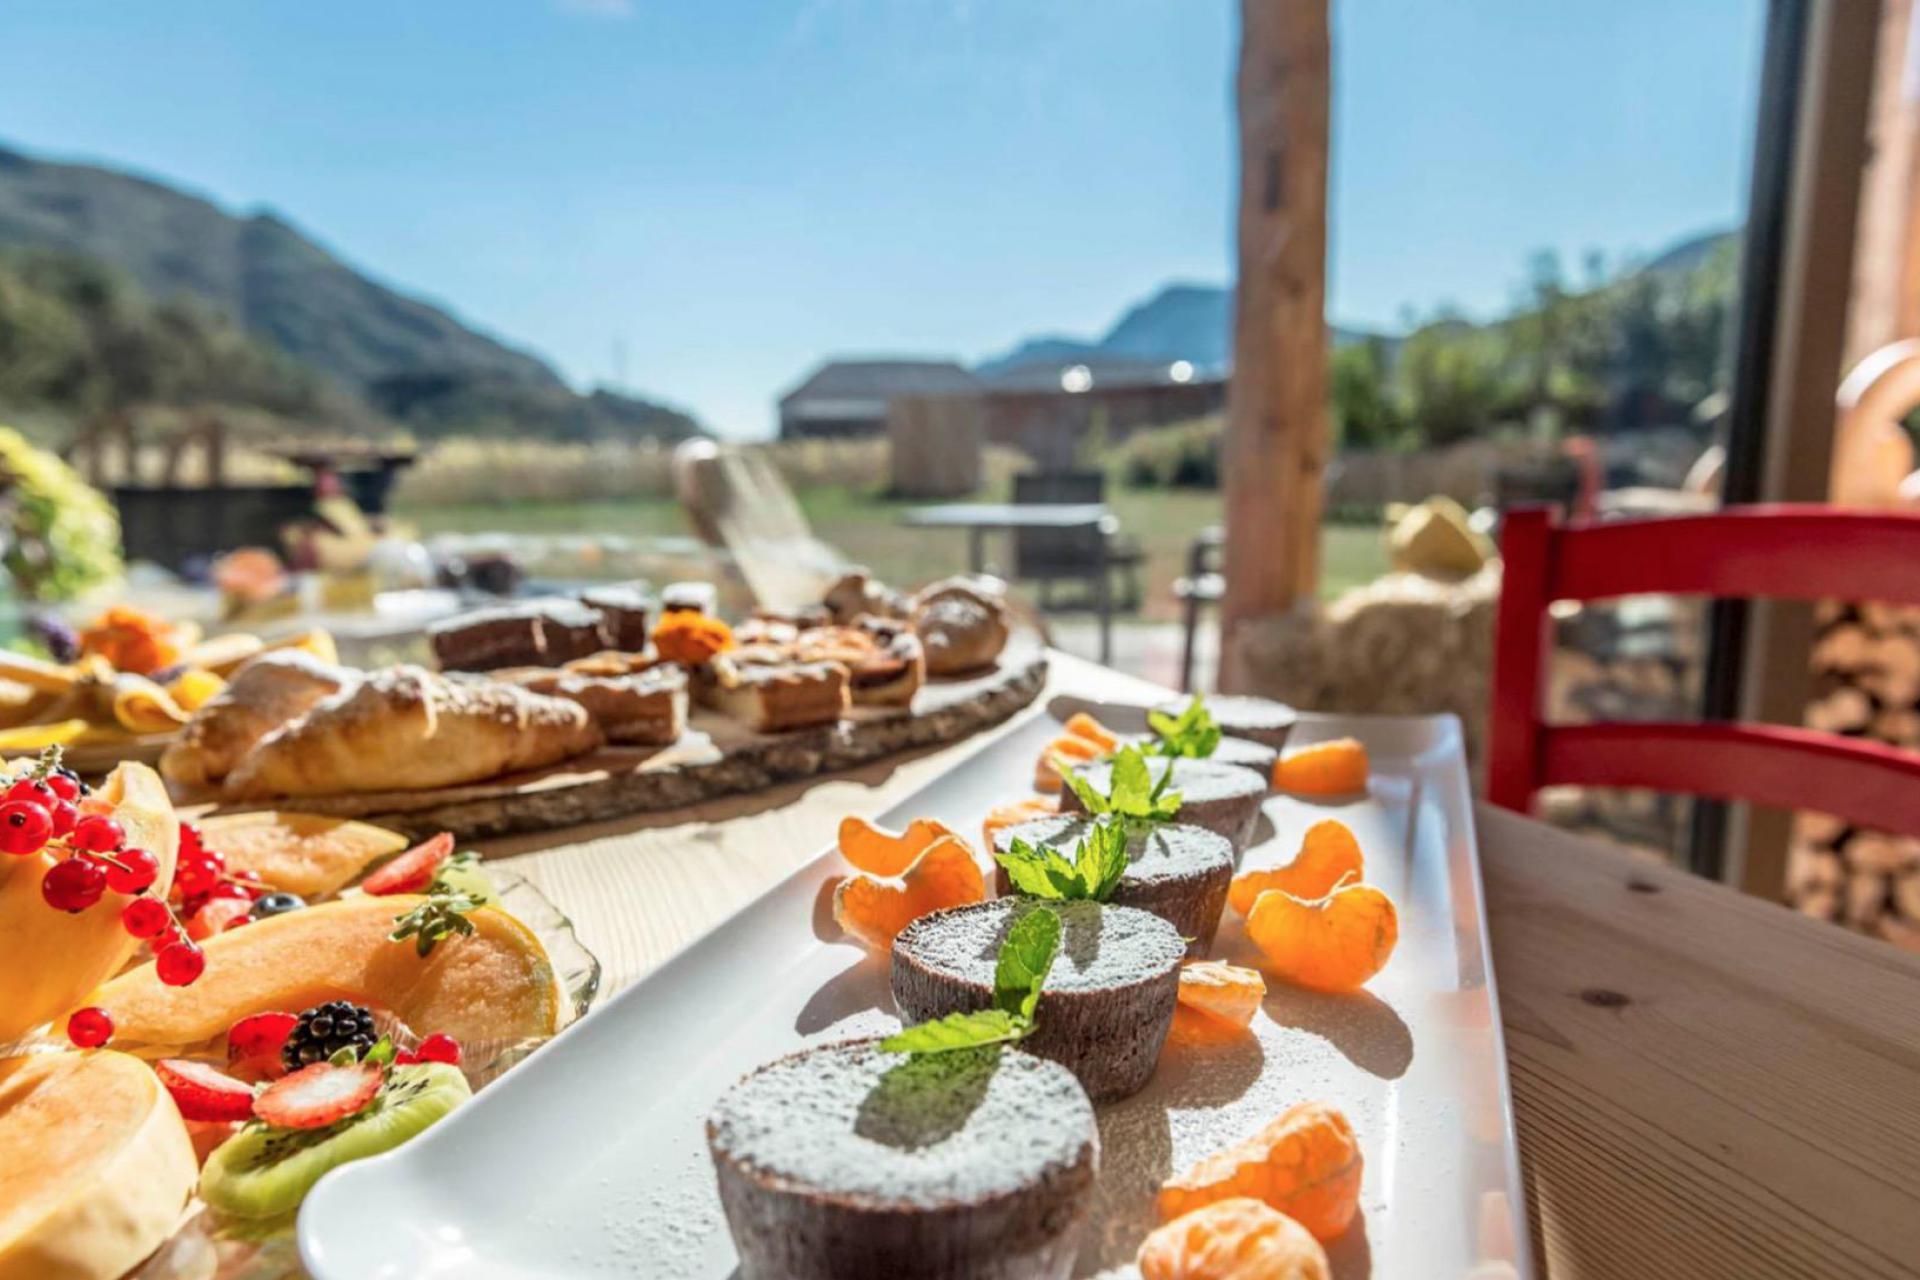 Agriturismo Dolomites Organic apple-agriturismo in the lake valley of Trentino